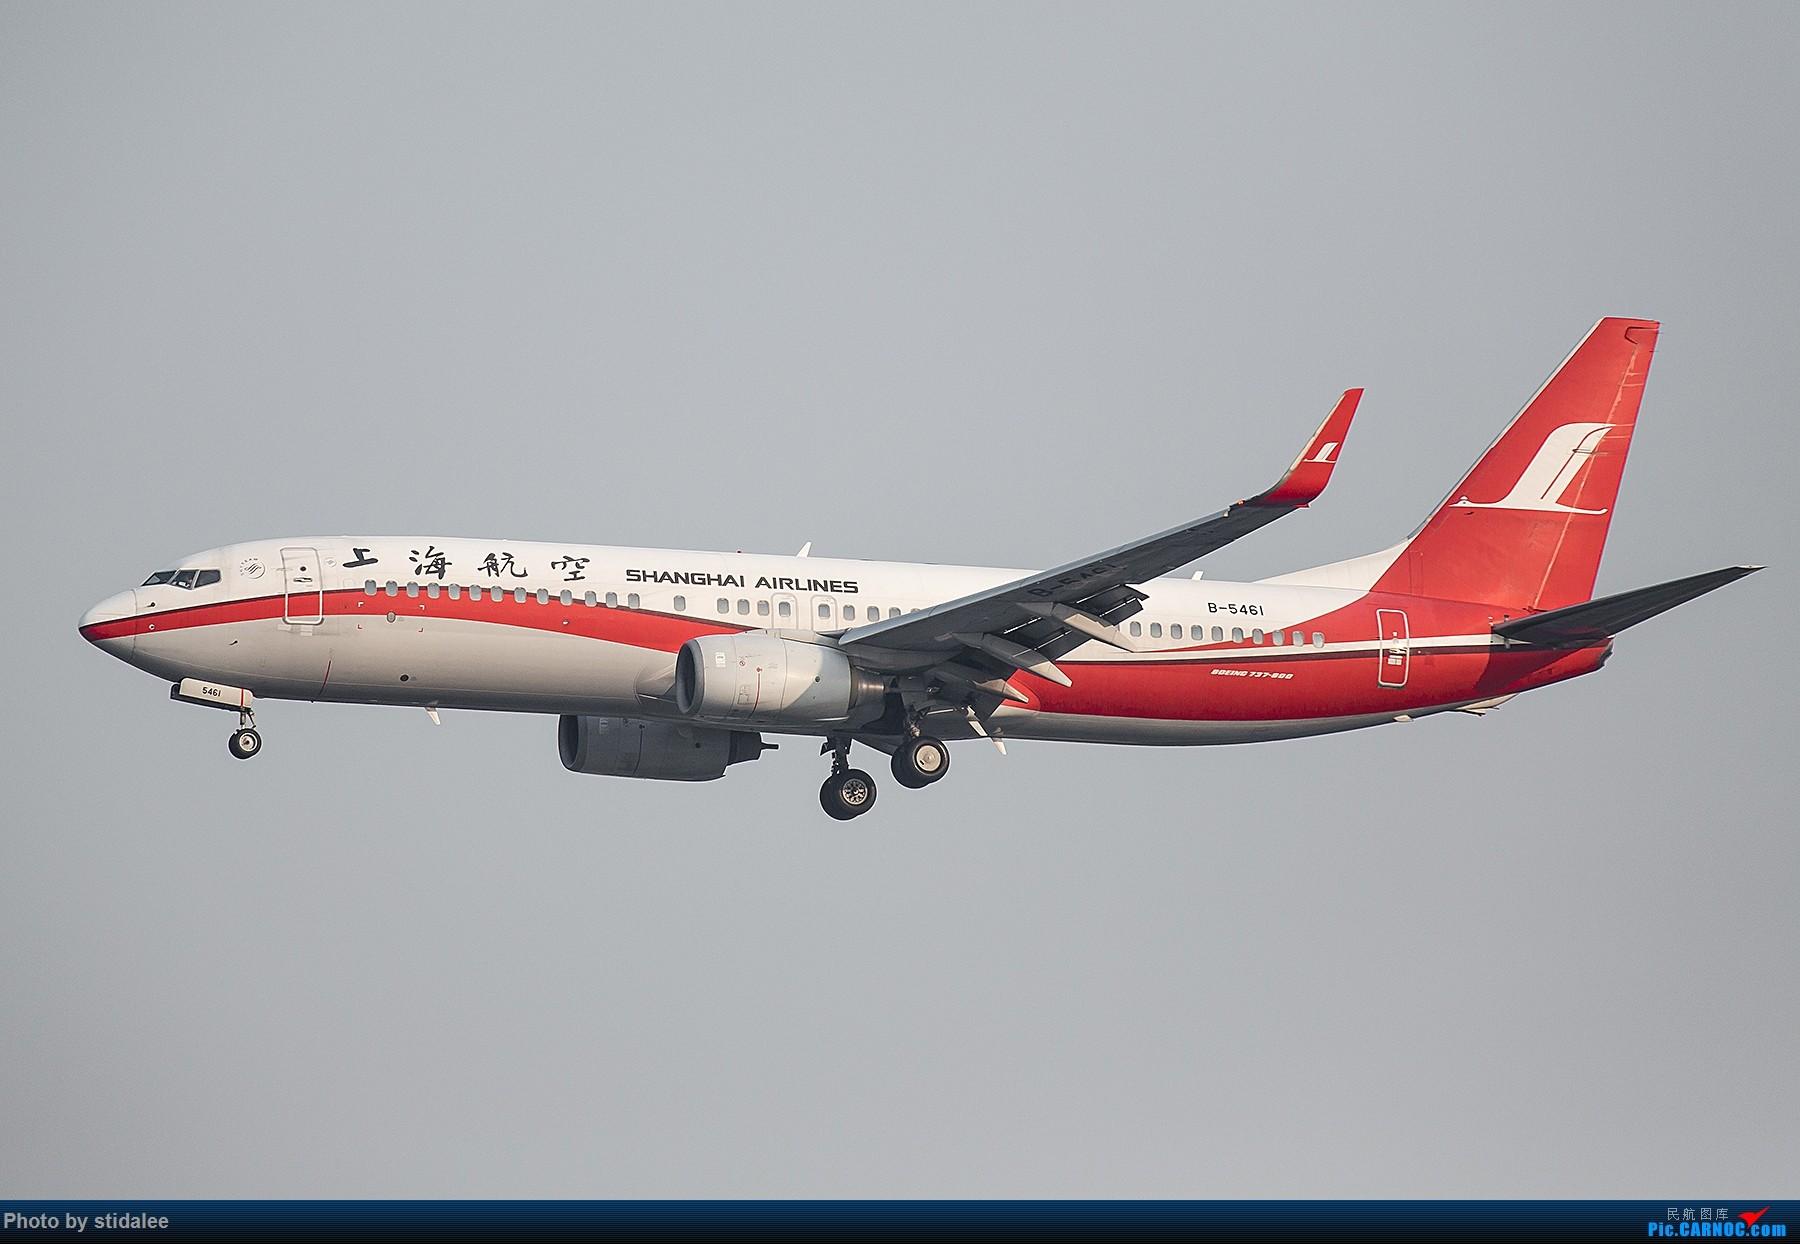 Re:[原创]SHA拍机 各种地主上航飞机 最喜欢的涂装 BOEING 737-800 B-5461 中国上海虹桥国际机场